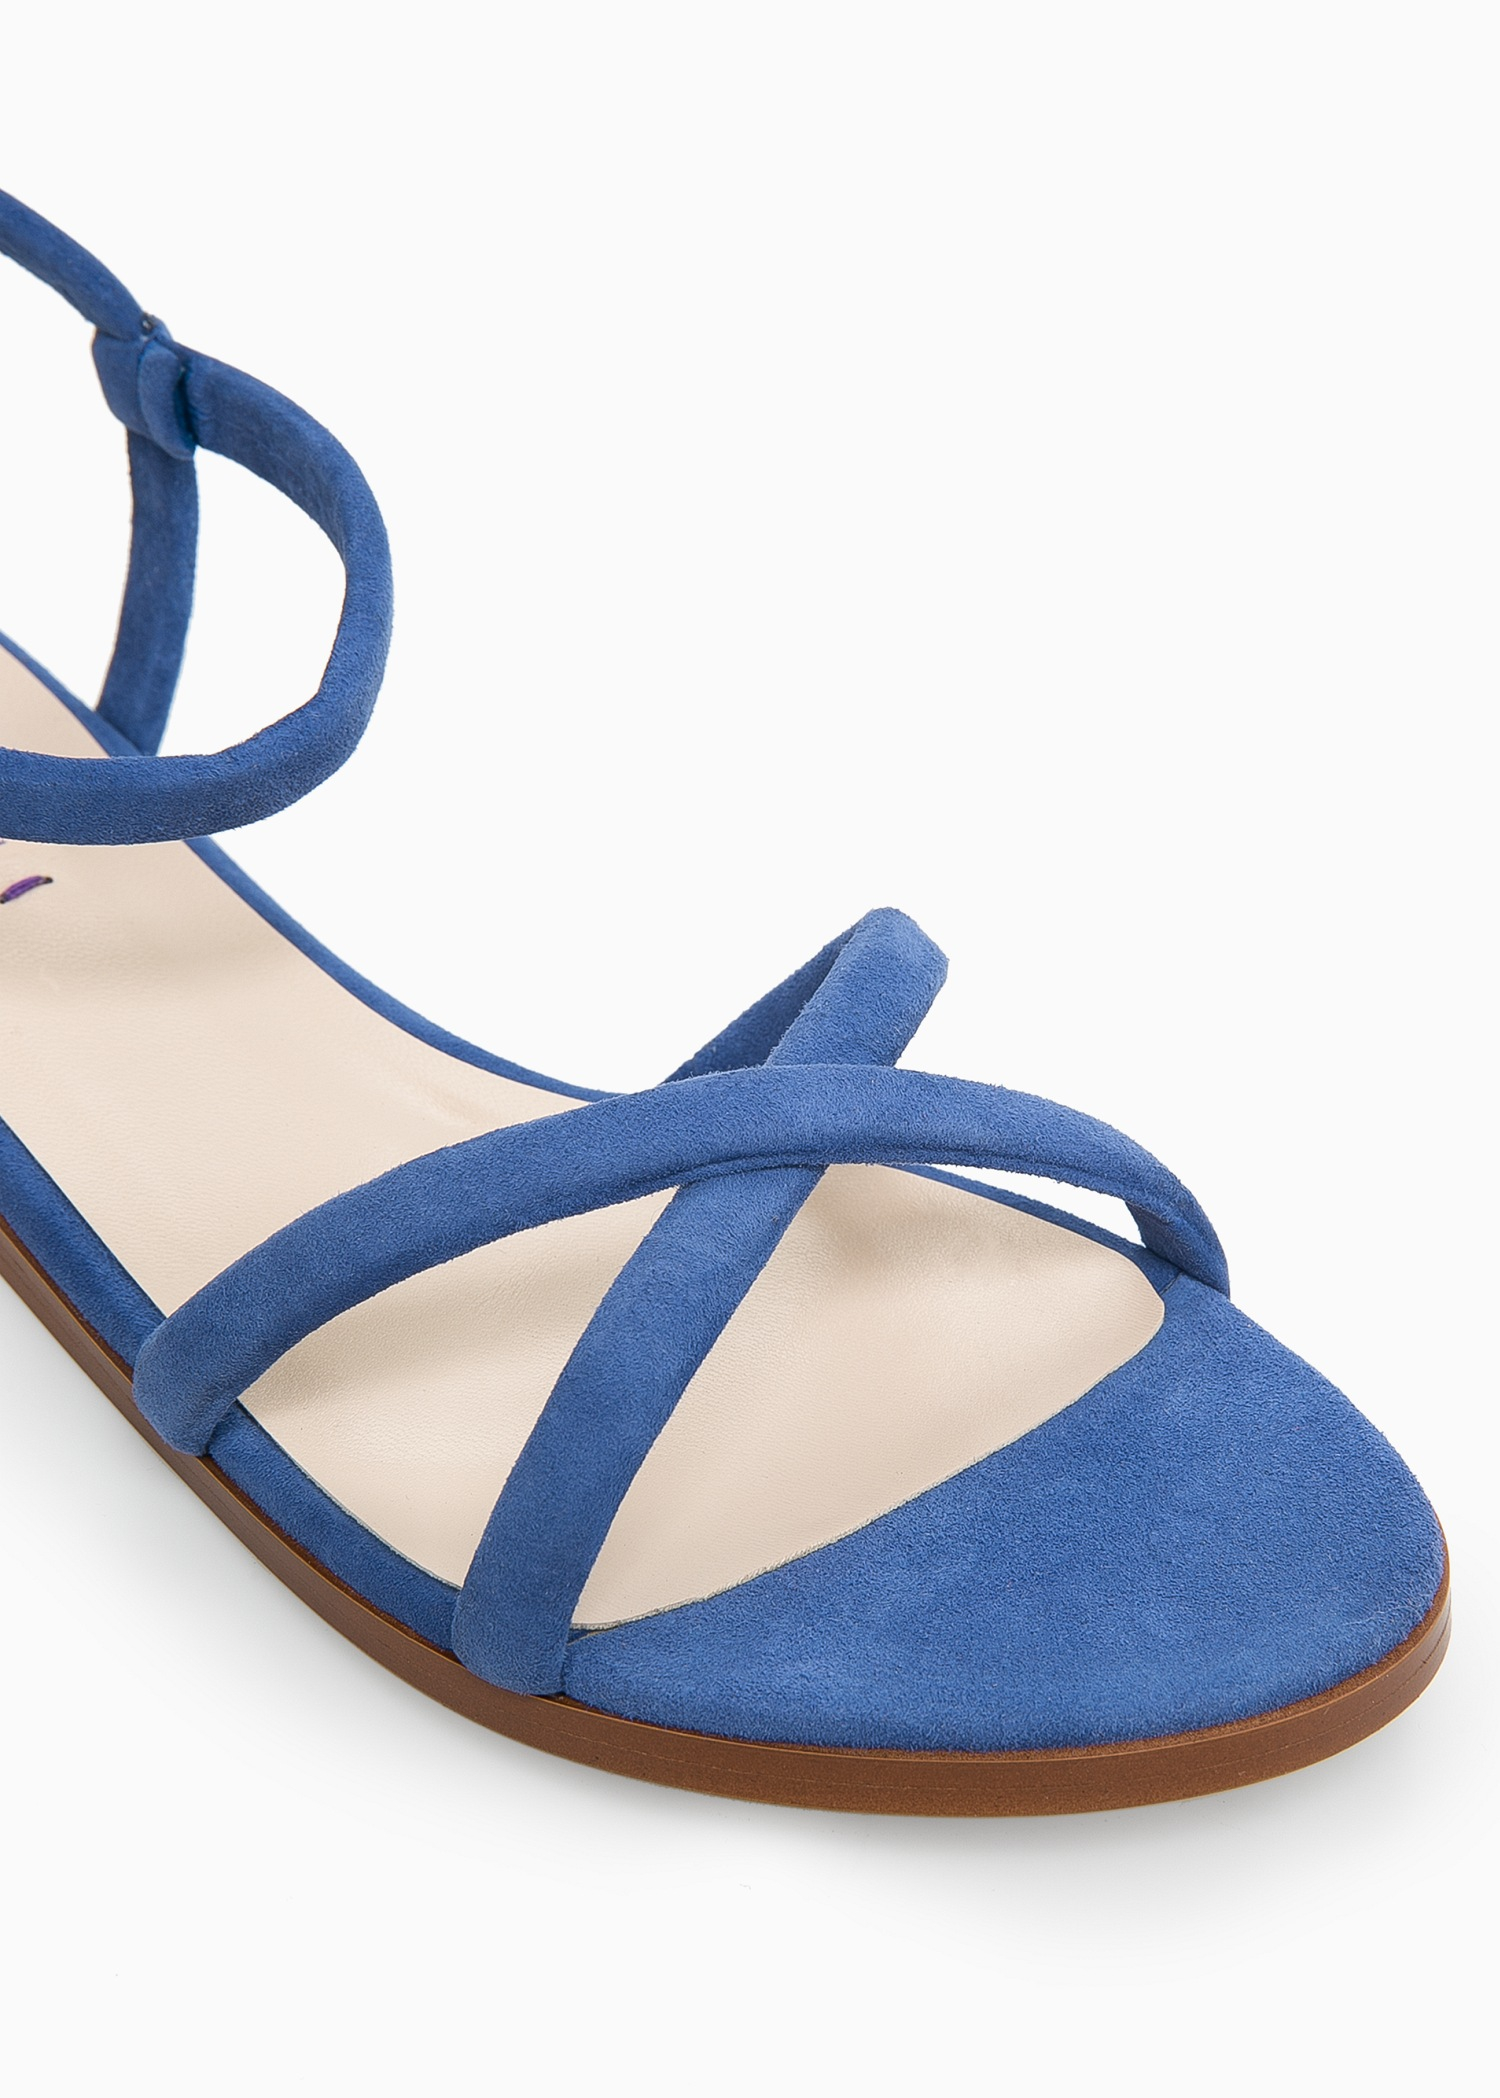 Blue Suede Flat Shoes